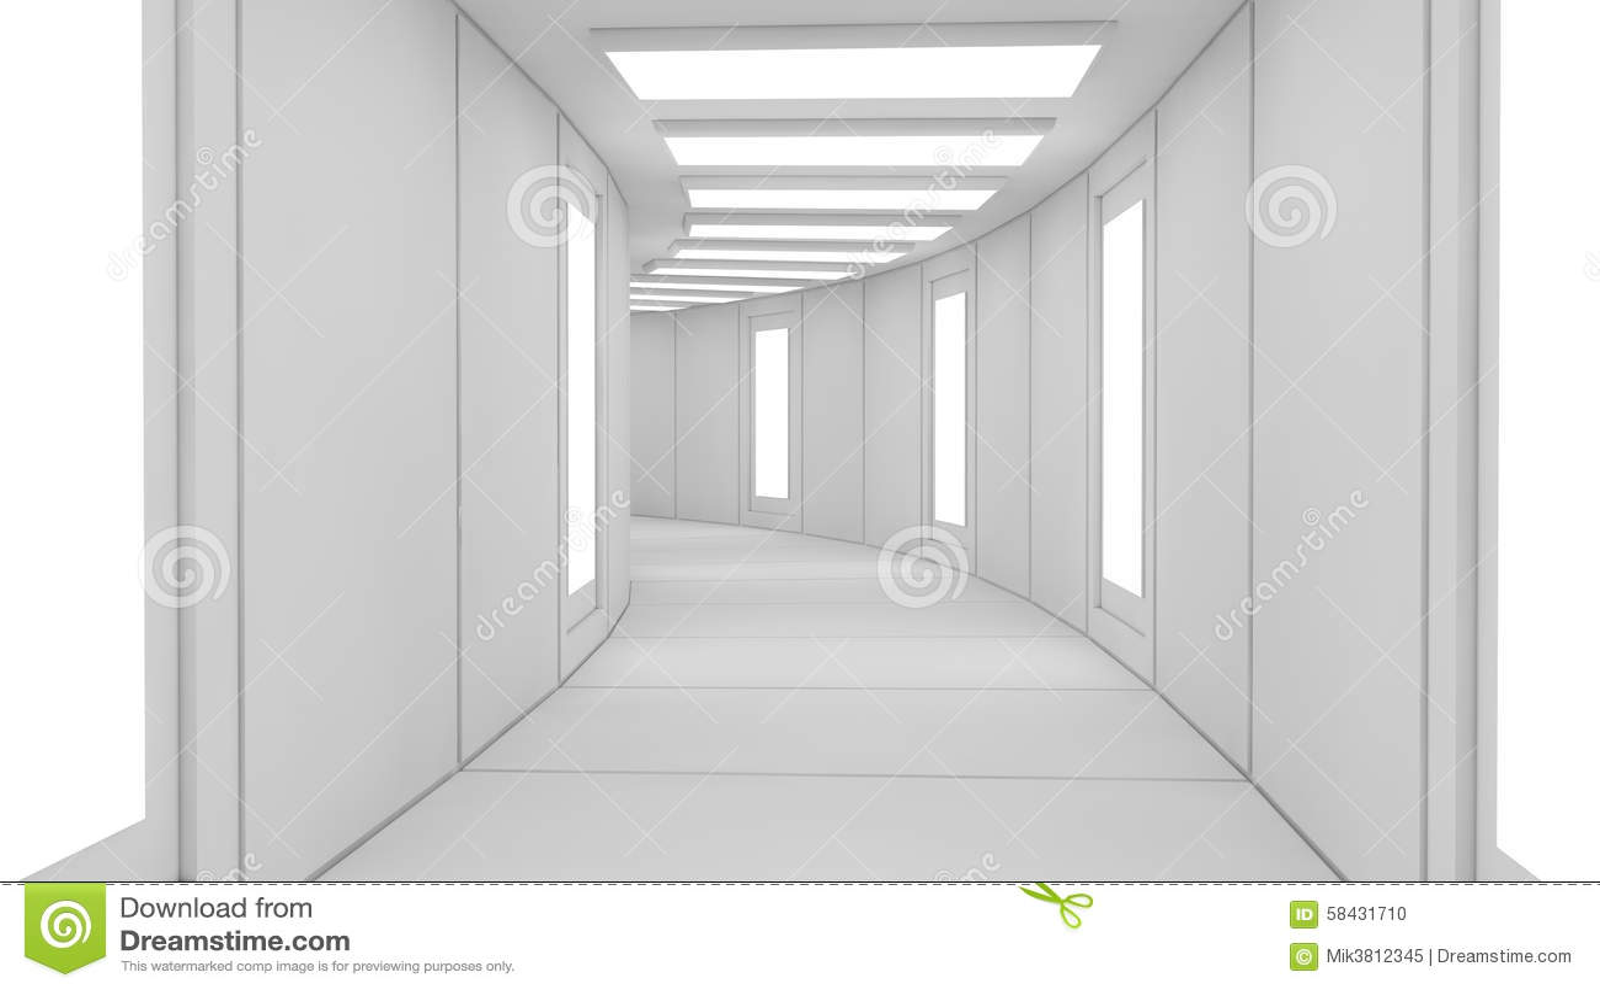 architecture futuriste d 39 int rieur de technologie photo stock image 58431710. Black Bedroom Furniture Sets. Home Design Ideas